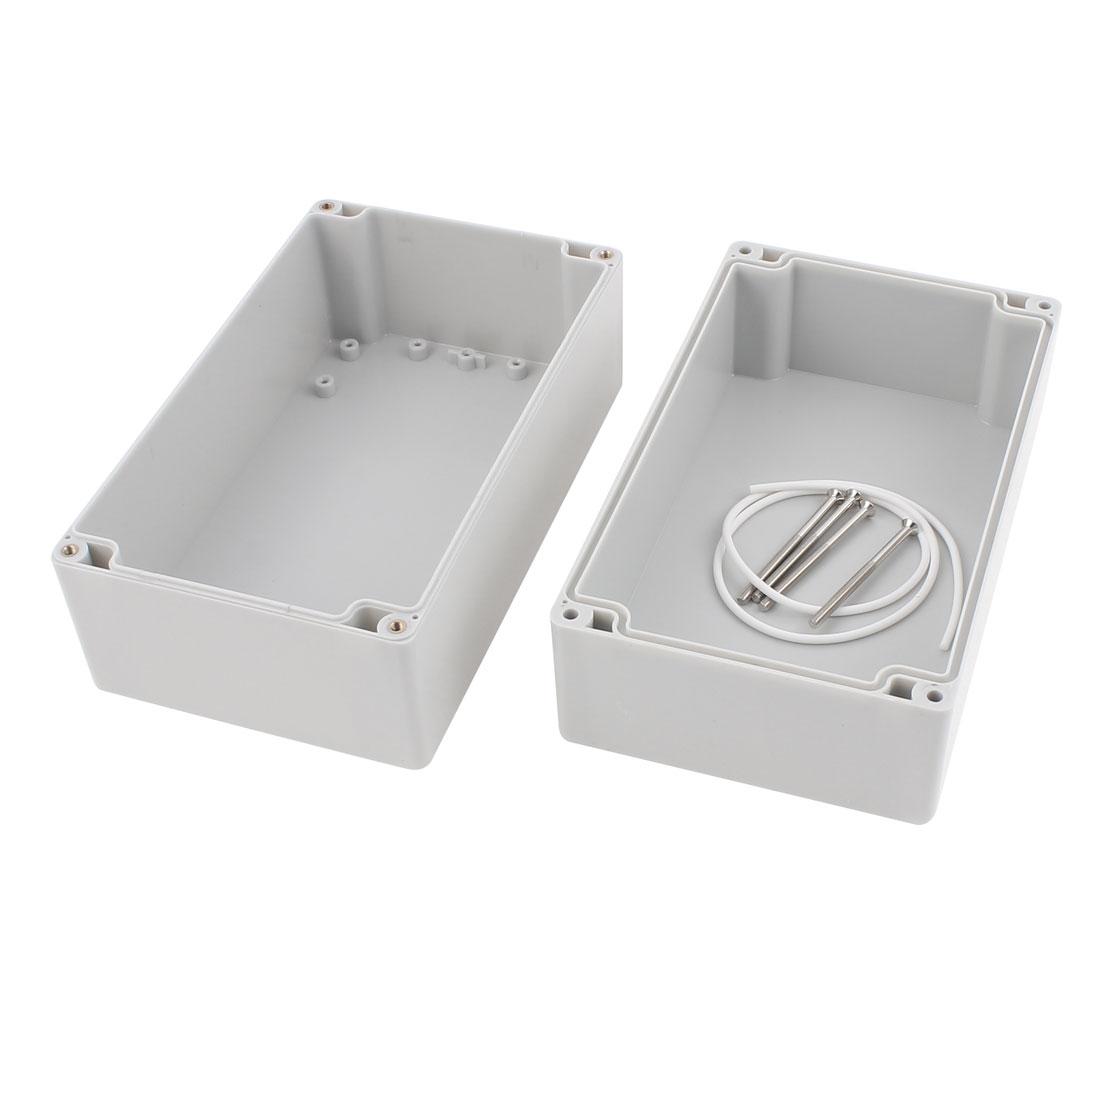 200-x-120-x-113mm-Waterproof-Junction-Box-DIY-Terminal-Connecting-Box-Enclosure